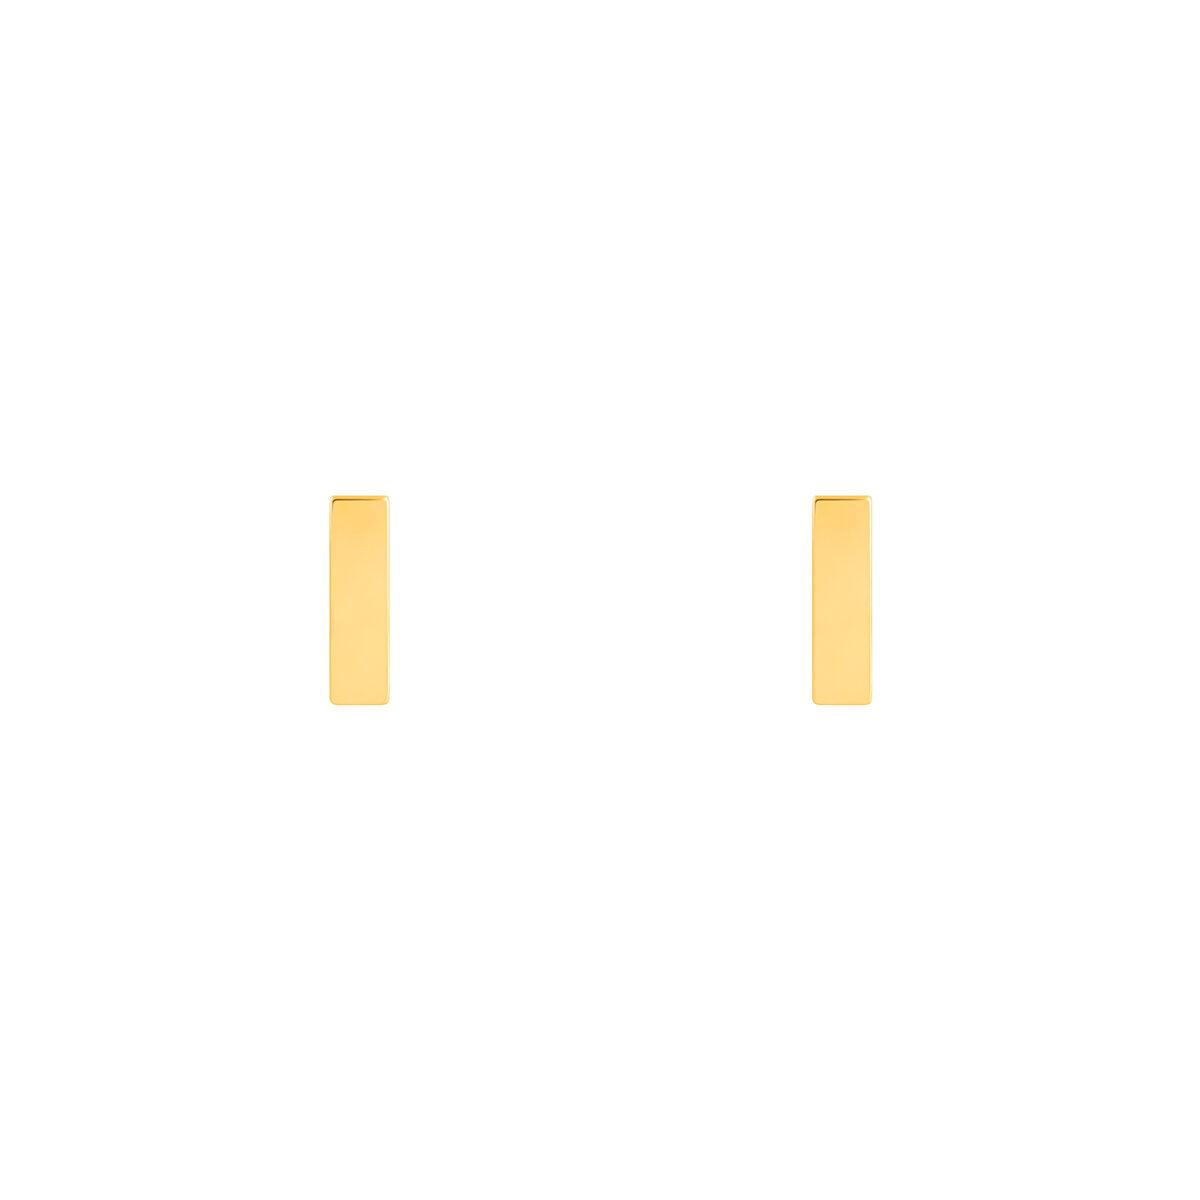 گوشواره طلا مستطیل